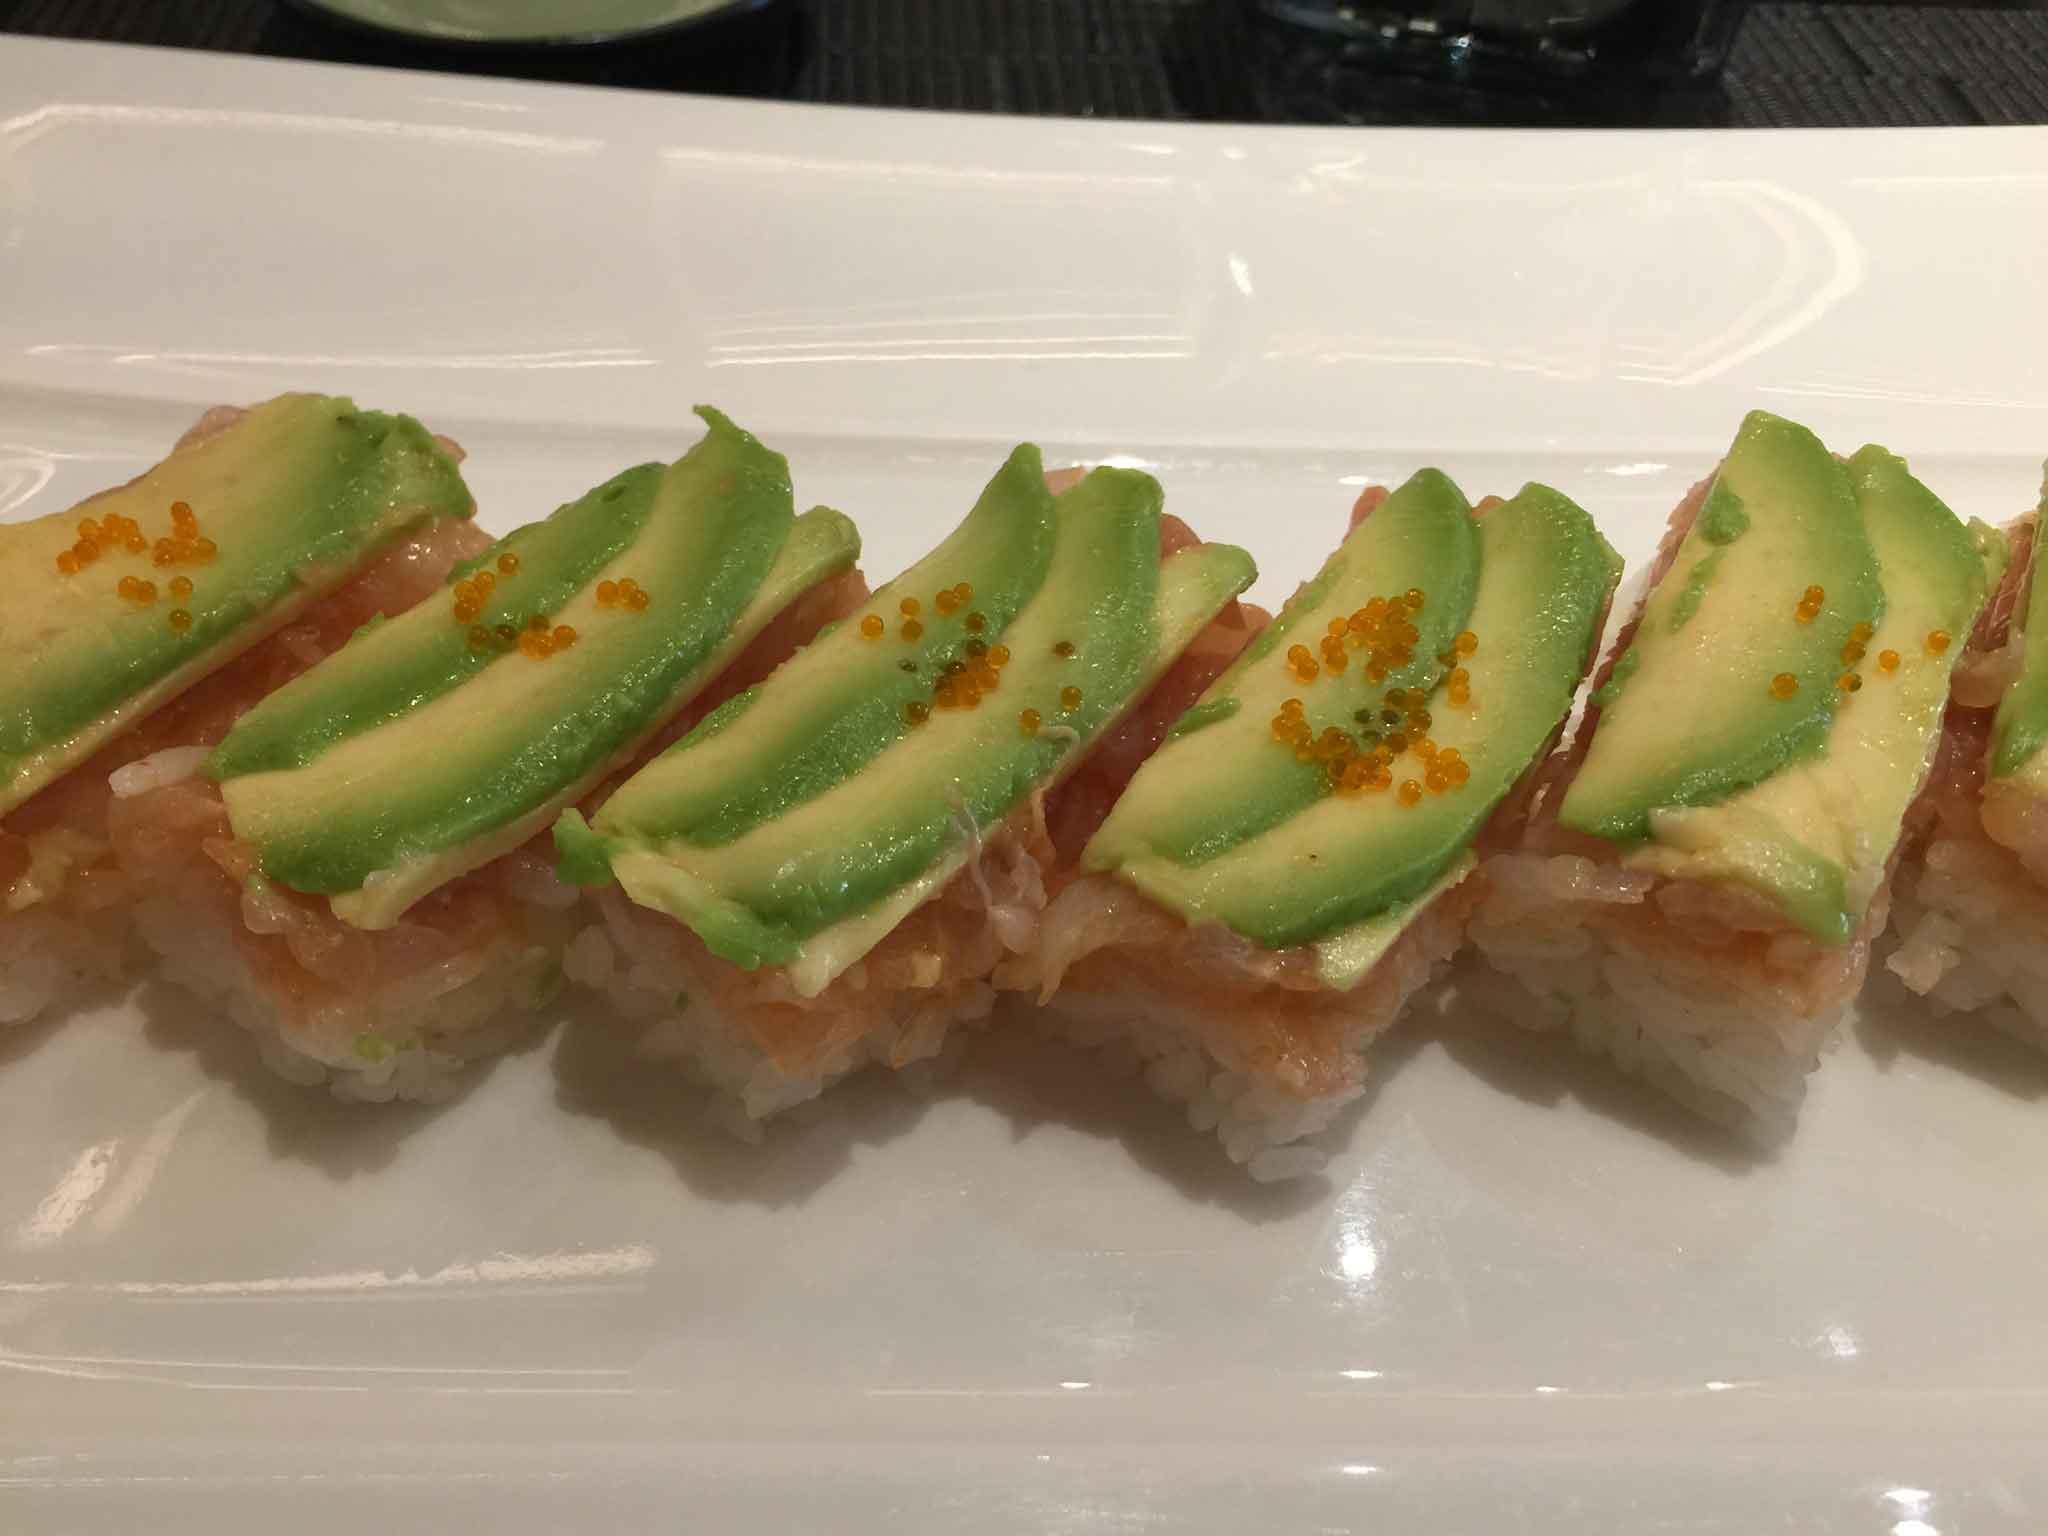 Milano Prezzi e assaggi di Aji nuova cucina giapponese take away di Iyo